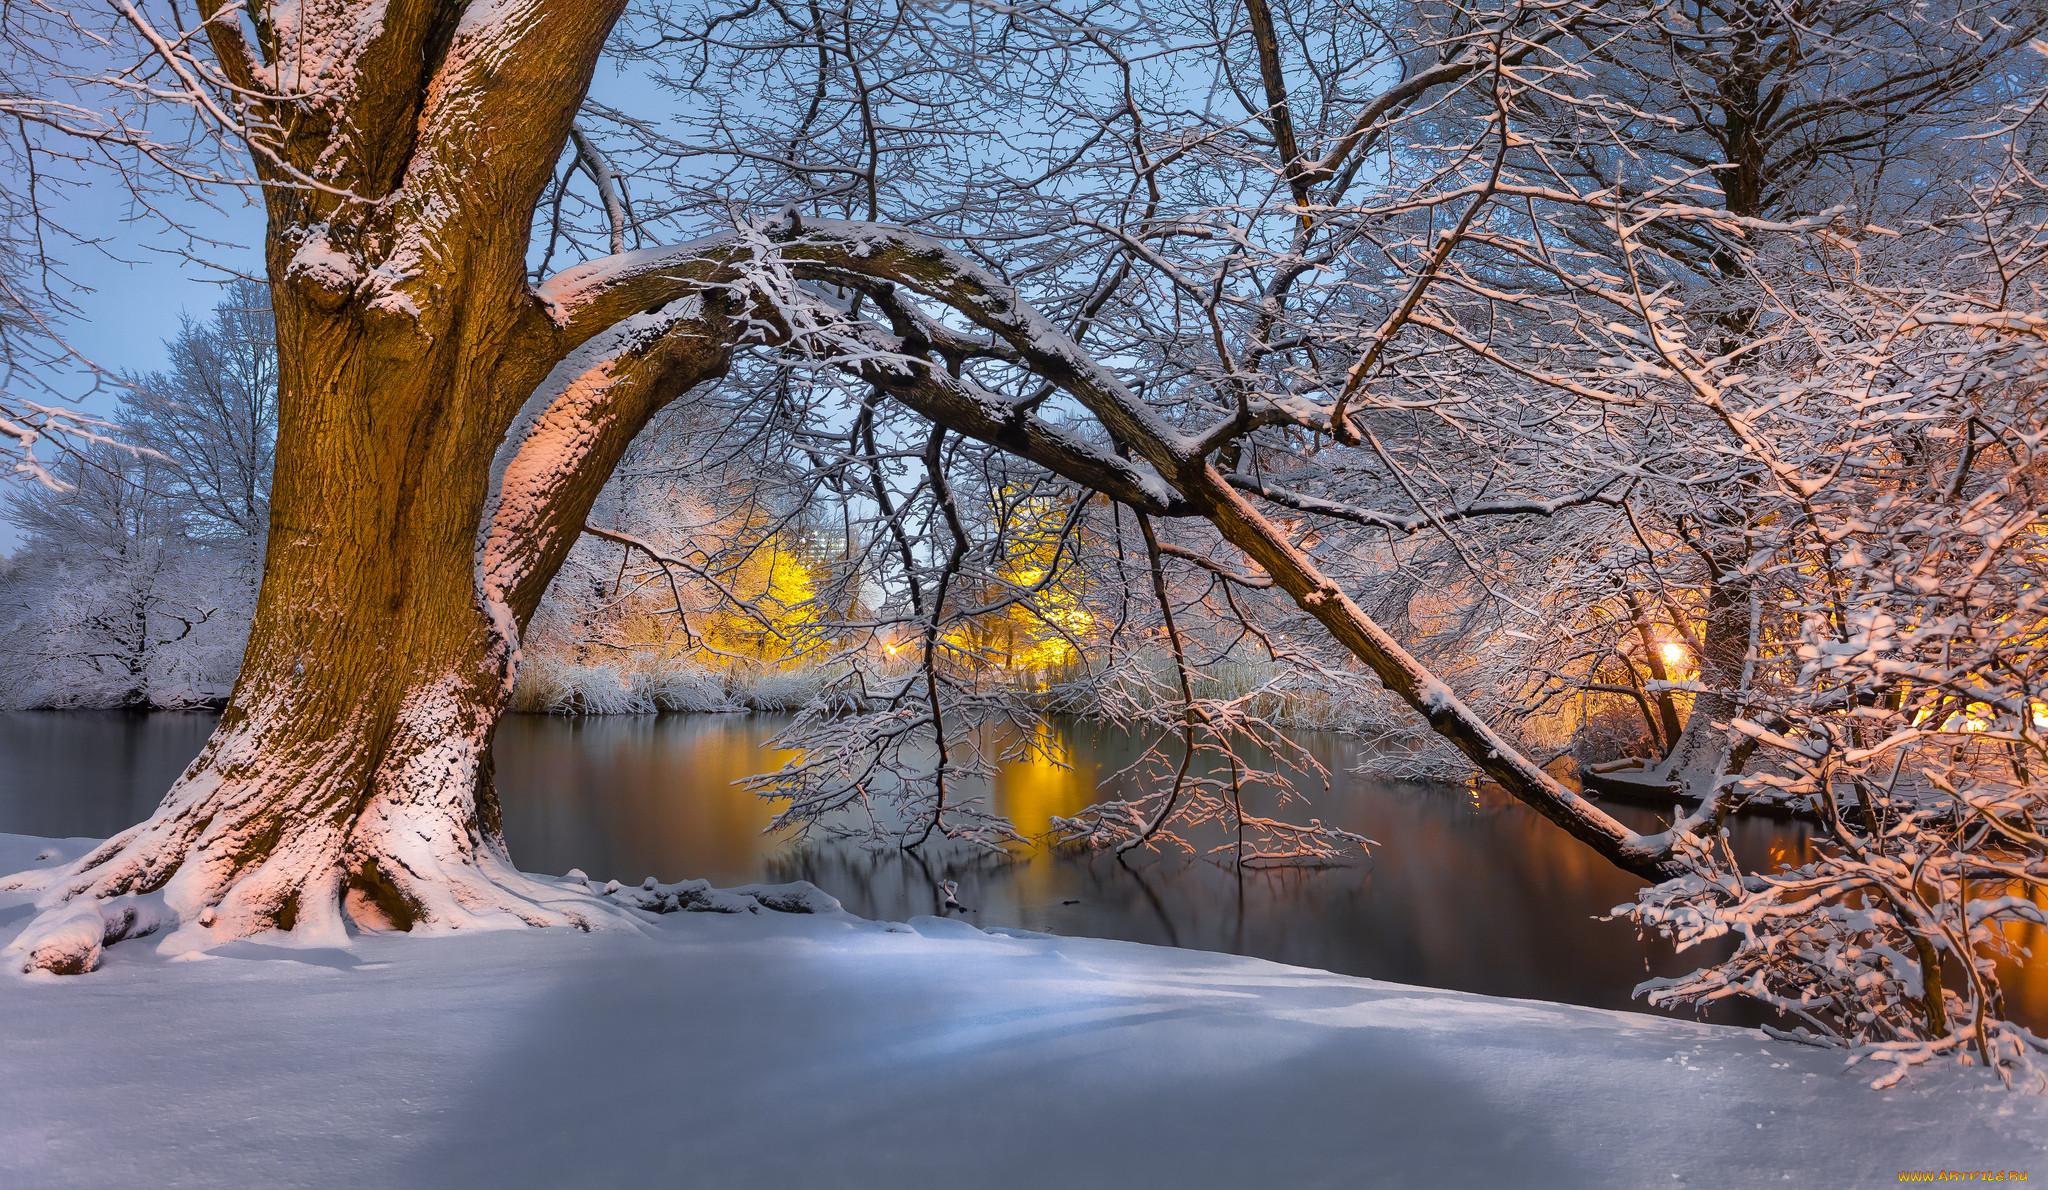 картинки на телефон зима весна хорошее